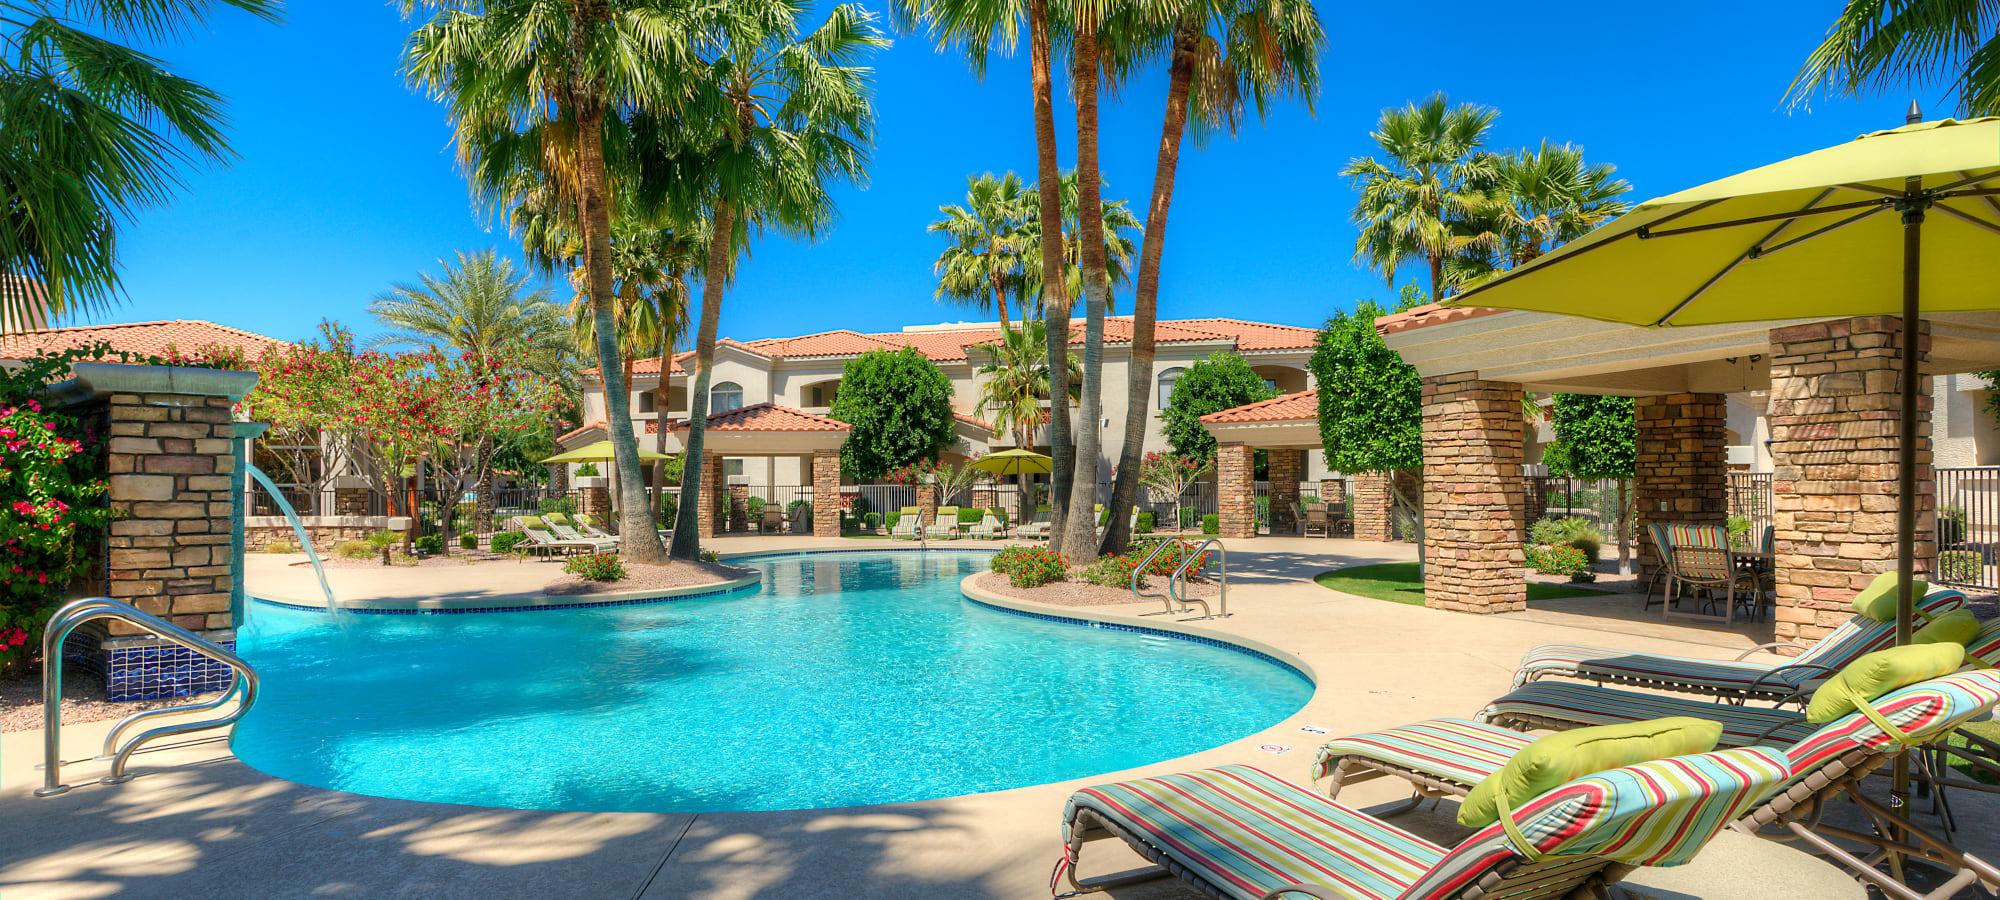 Luxurious swimming pool with lounge chairs at San Prado in Glendale, Arizona